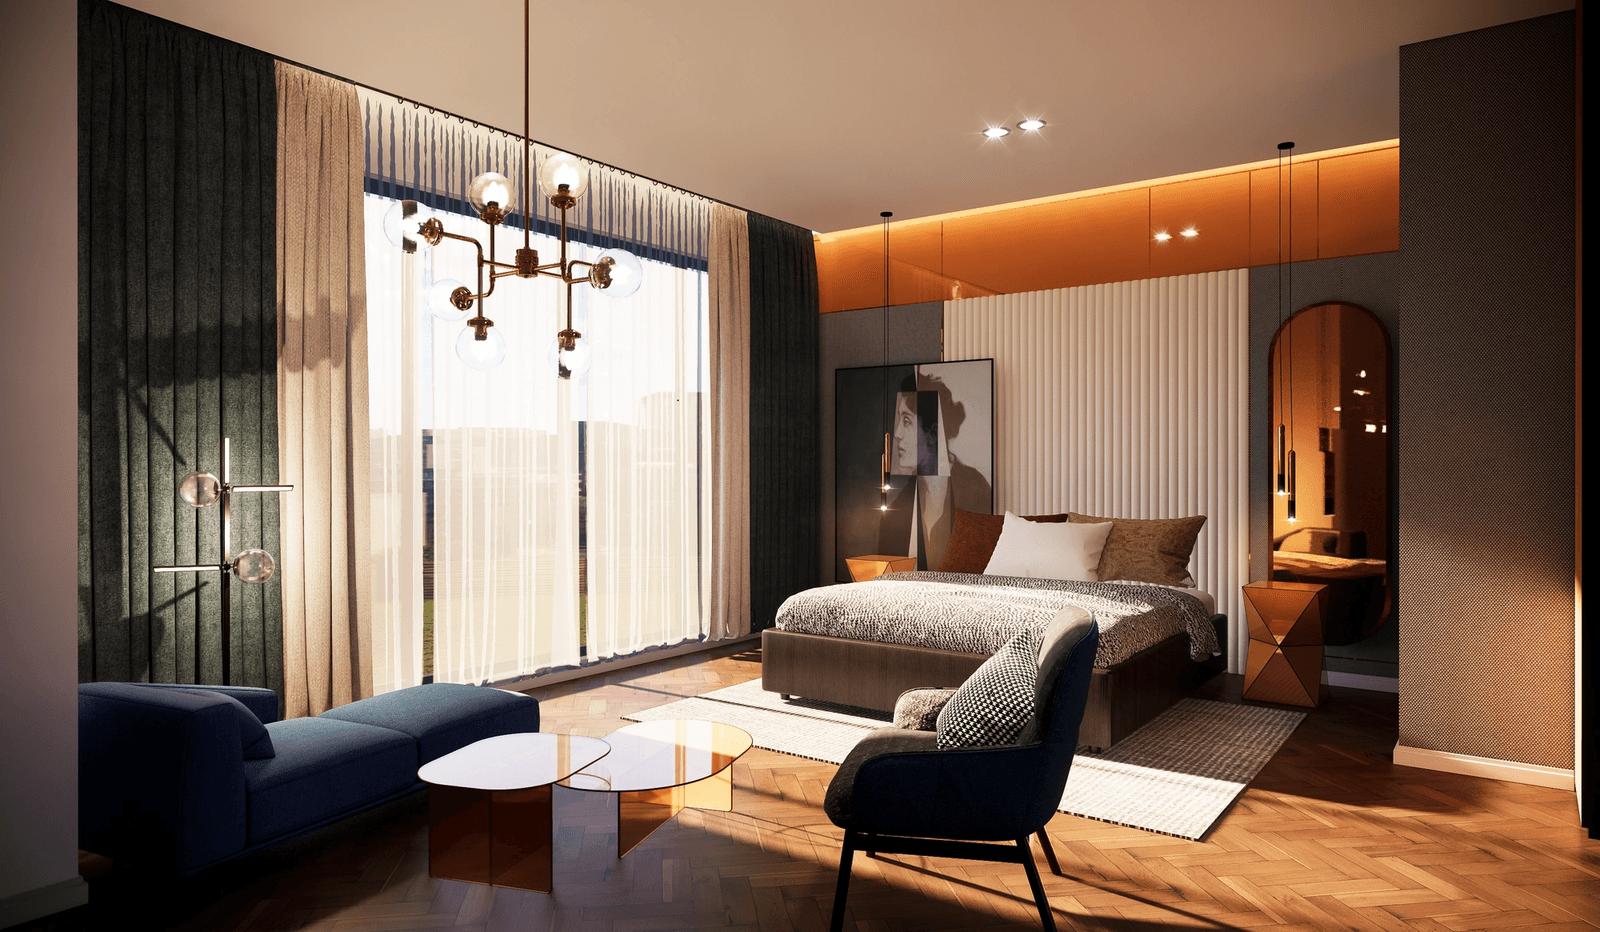 Hotel Karl Guest Room